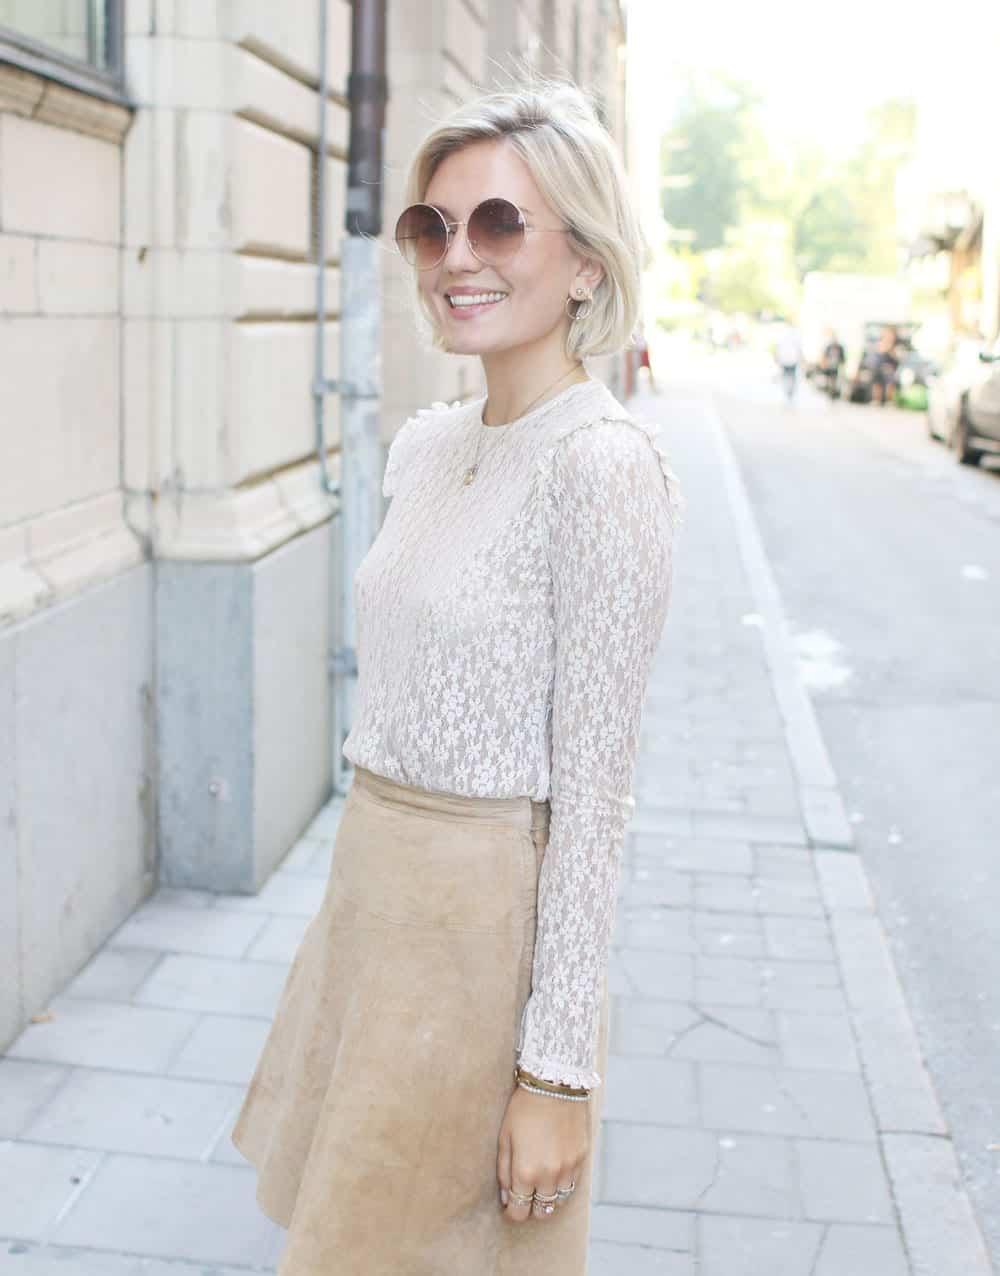 53.-suede Cute Seude Skirt Outfits-17 Ways to Wear Seude Skirts